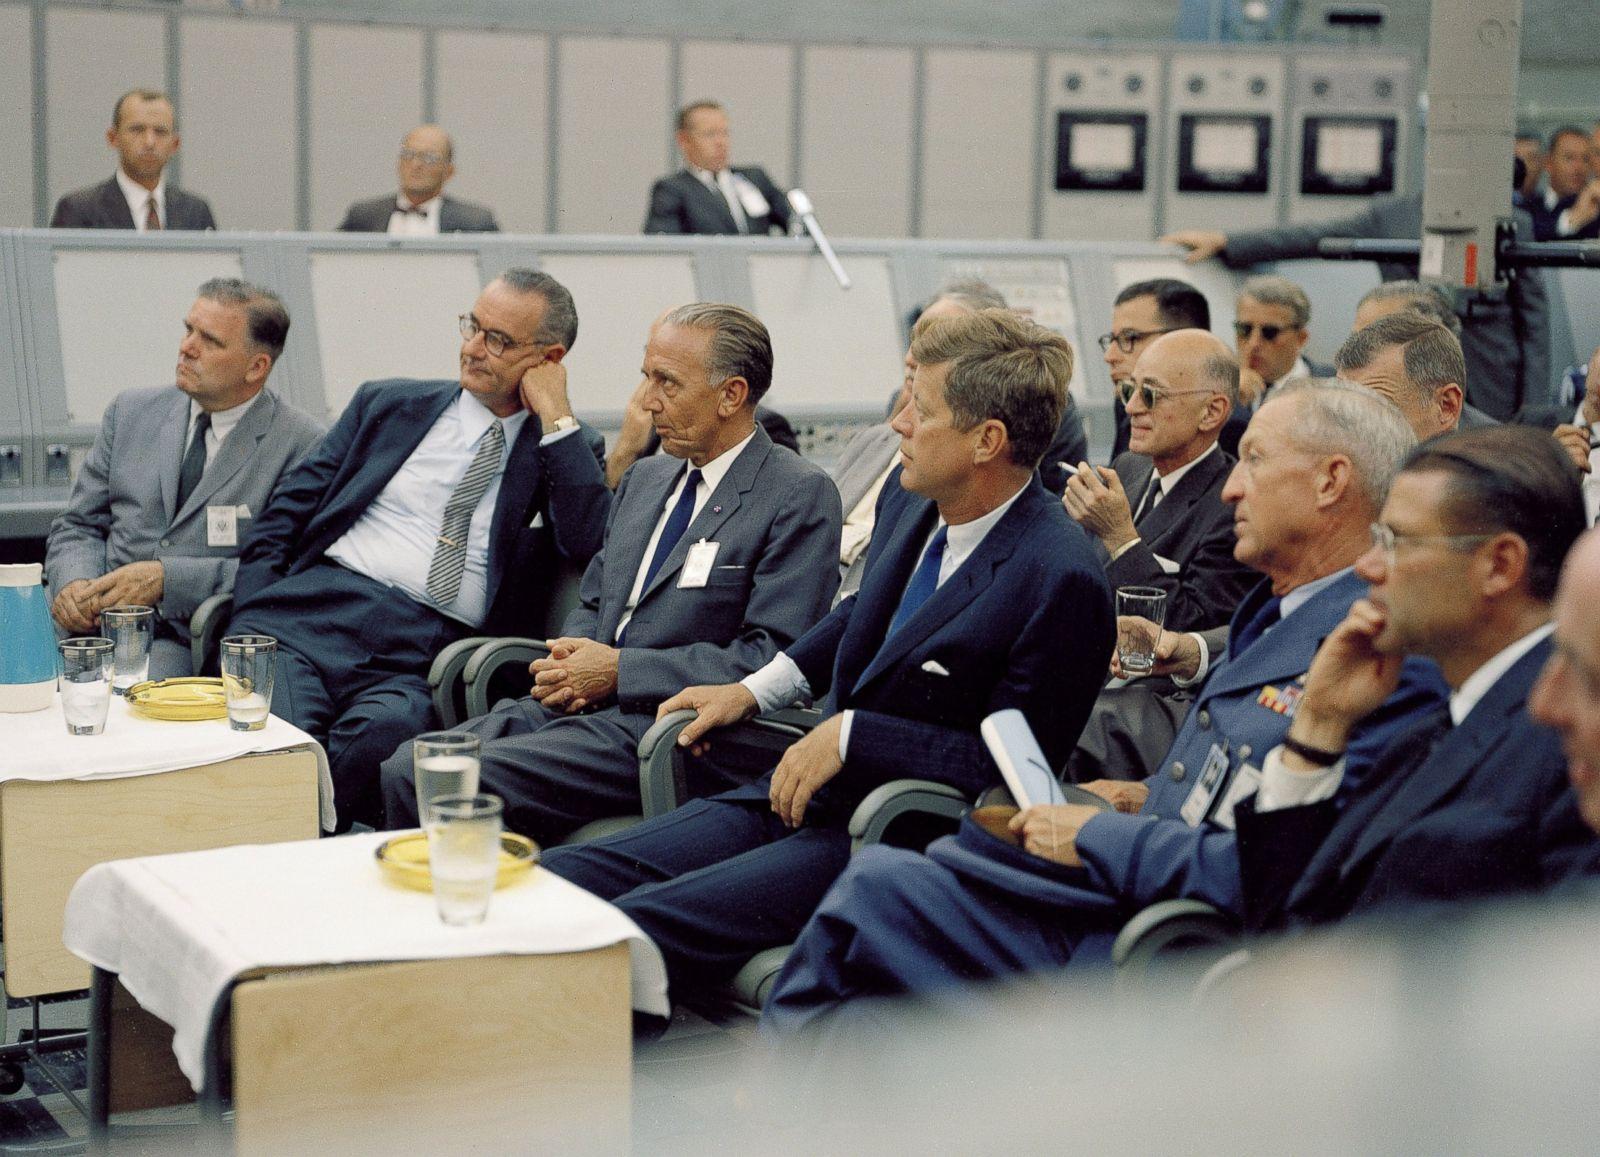 Kennedy president john f